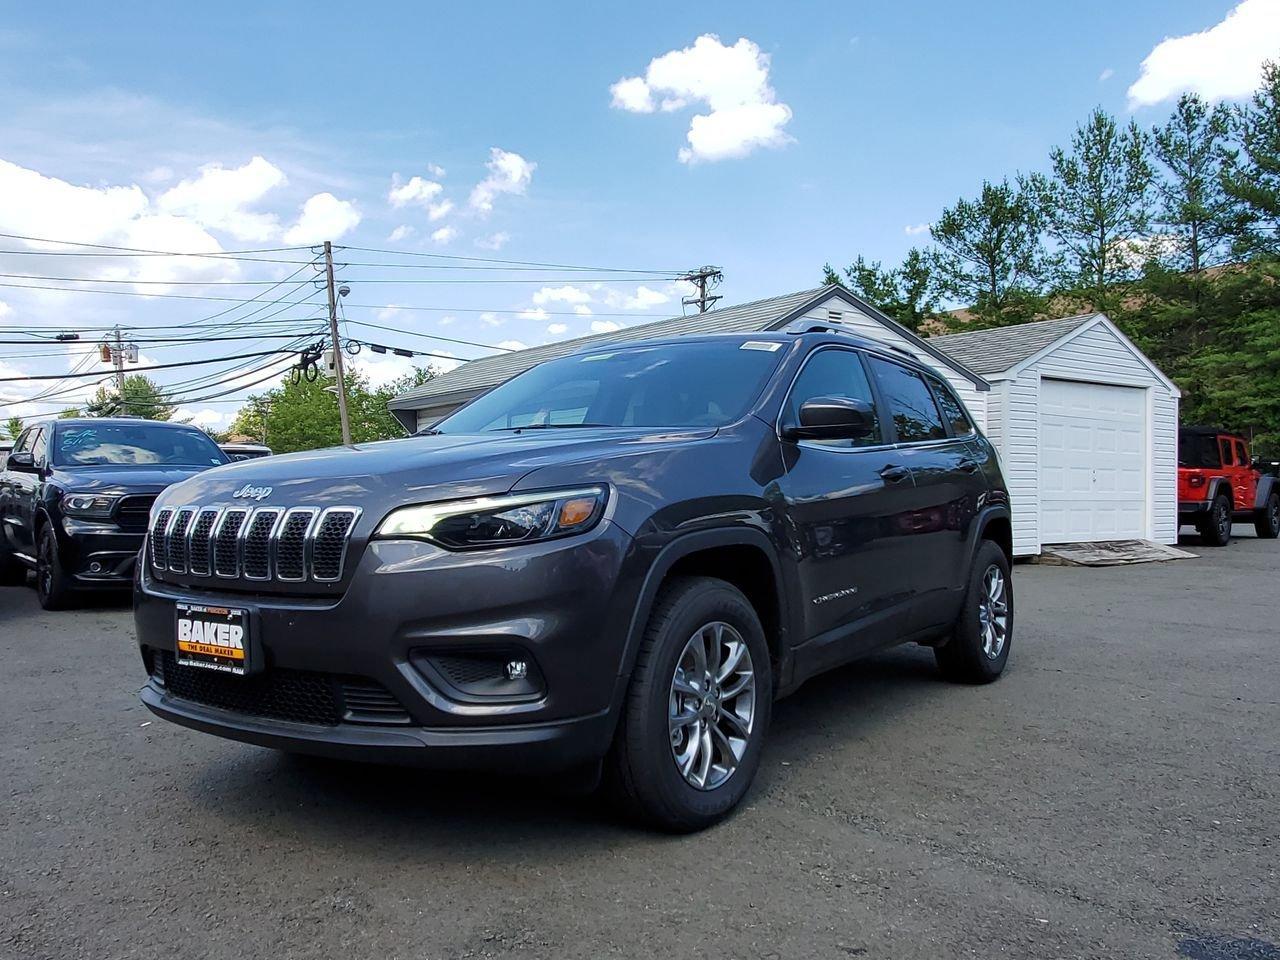 Used 2019 Jeep Cherokee Latitude Plus For Sale 24 295 Victory Lotus Stock 413679